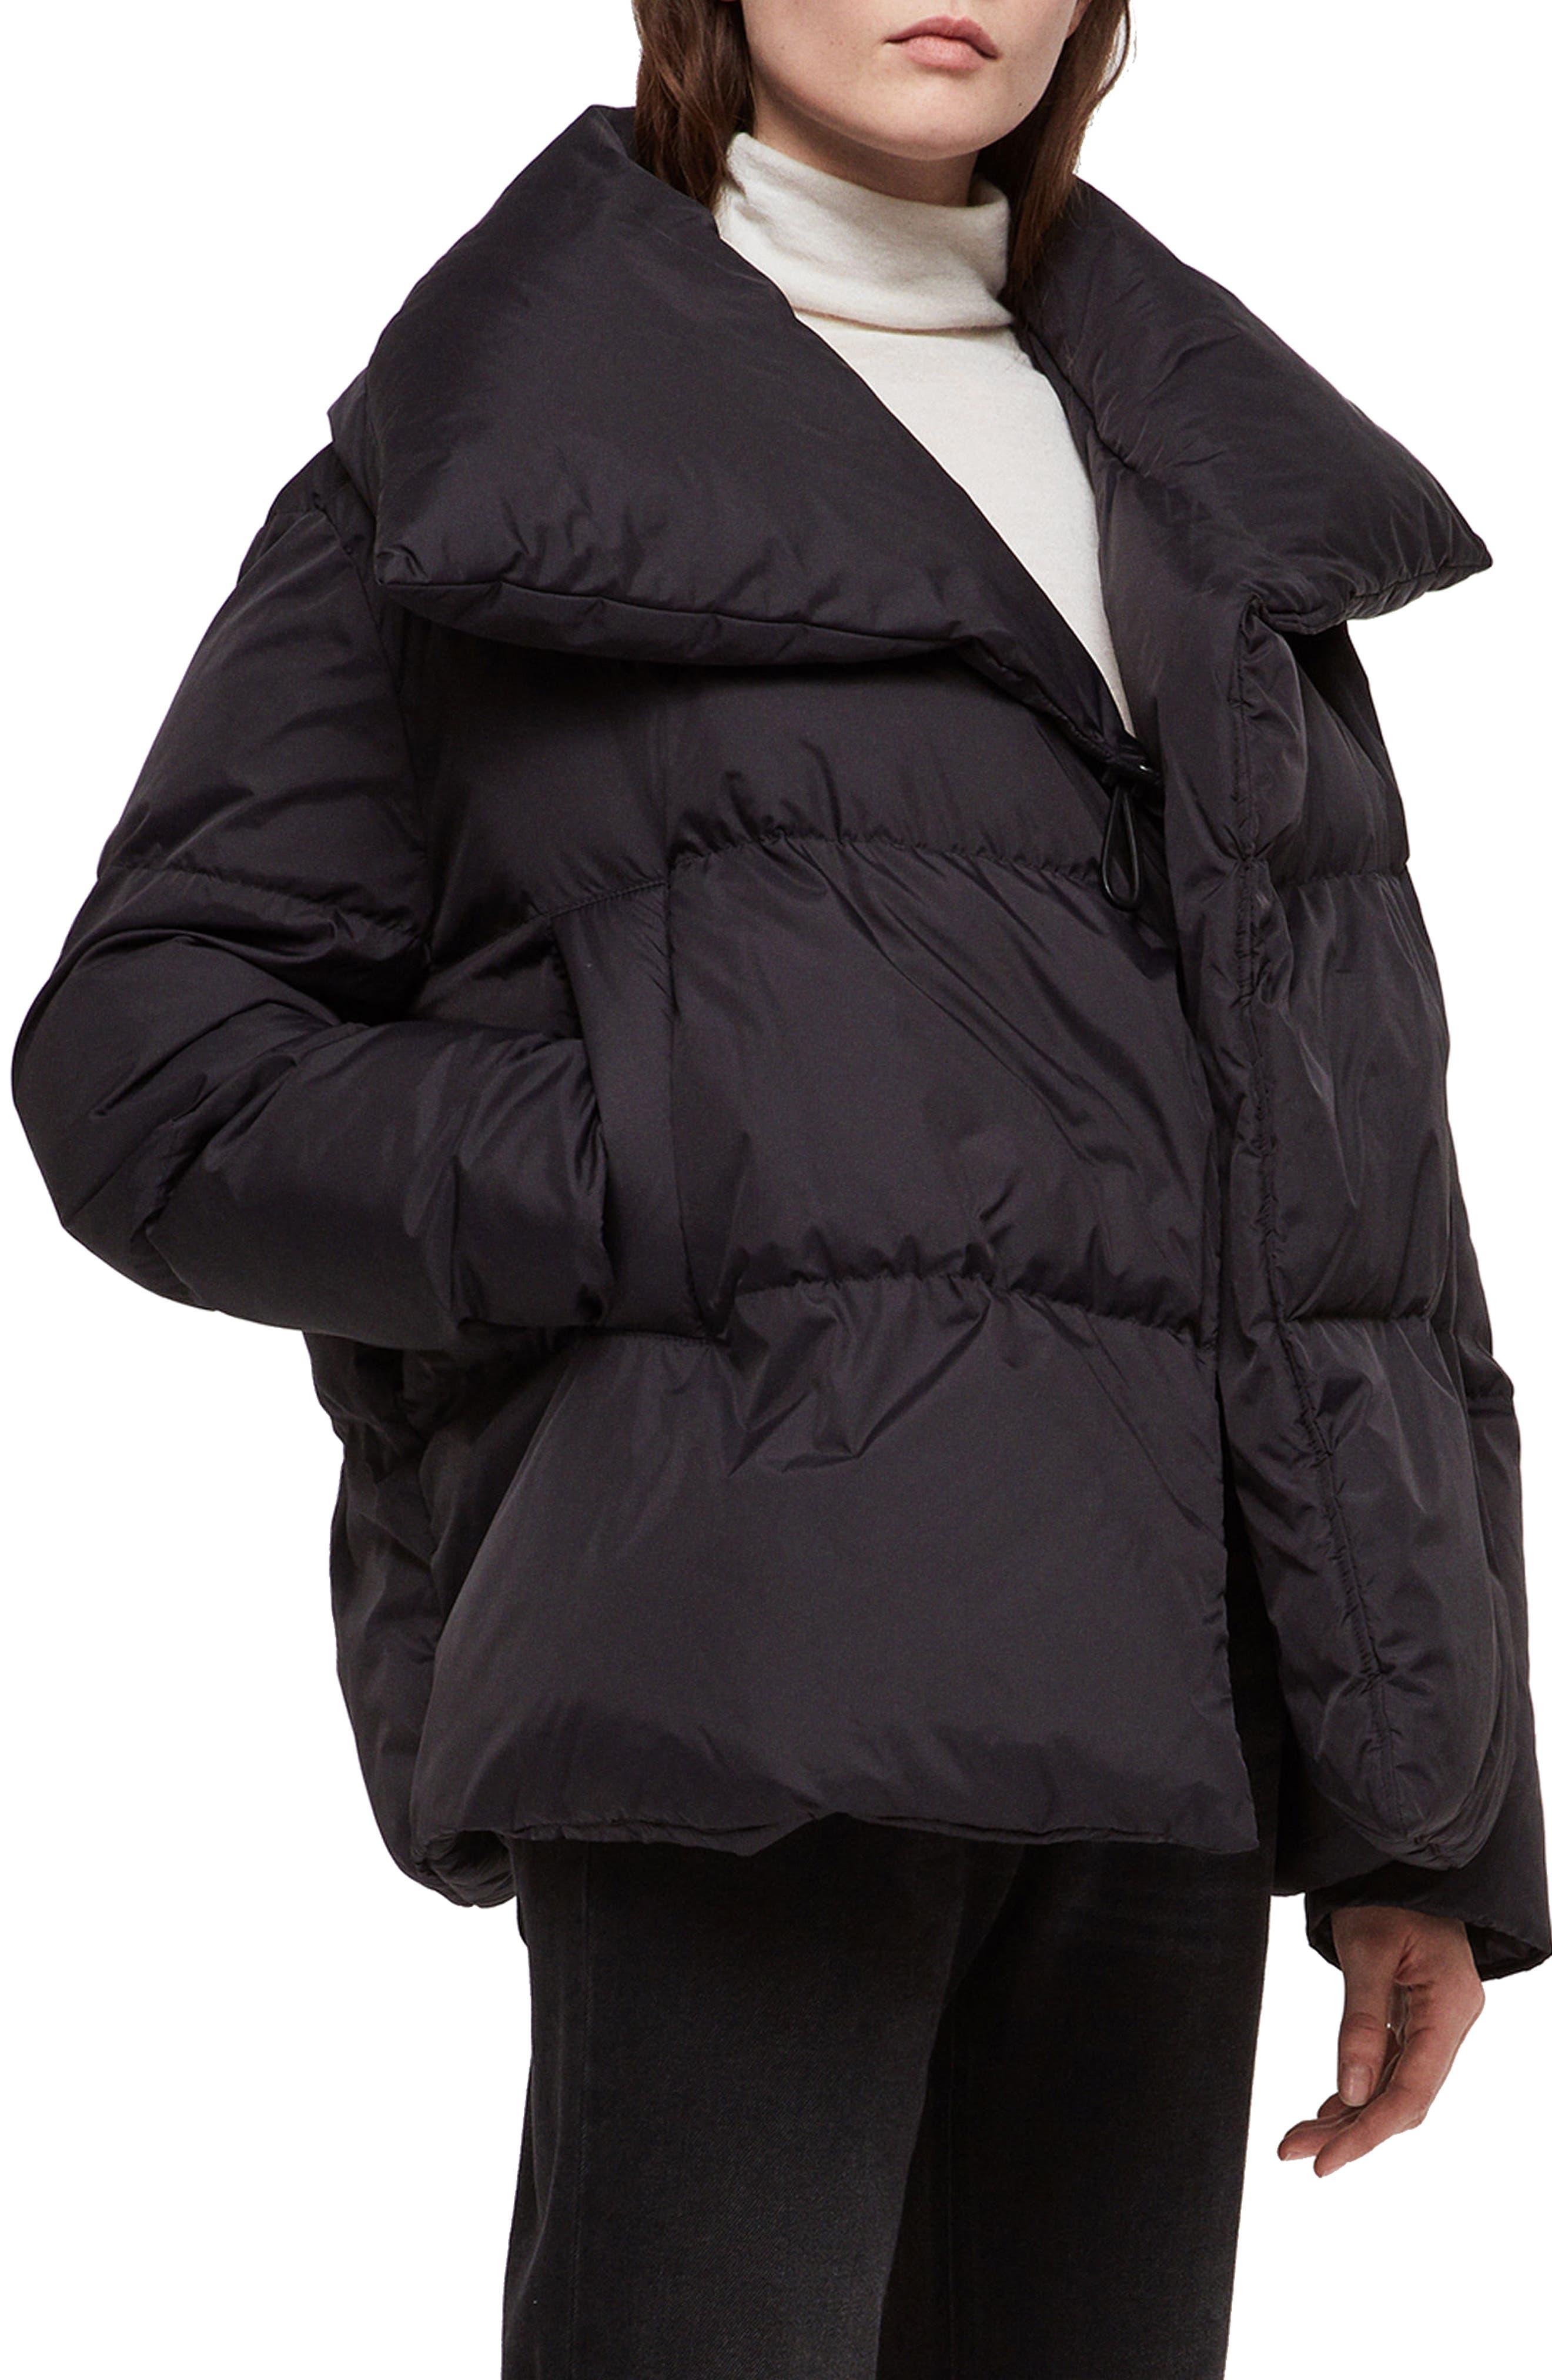 ALLSAINTS, Vrai Avia Puffer Jacket, Main thumbnail 1, color, 001